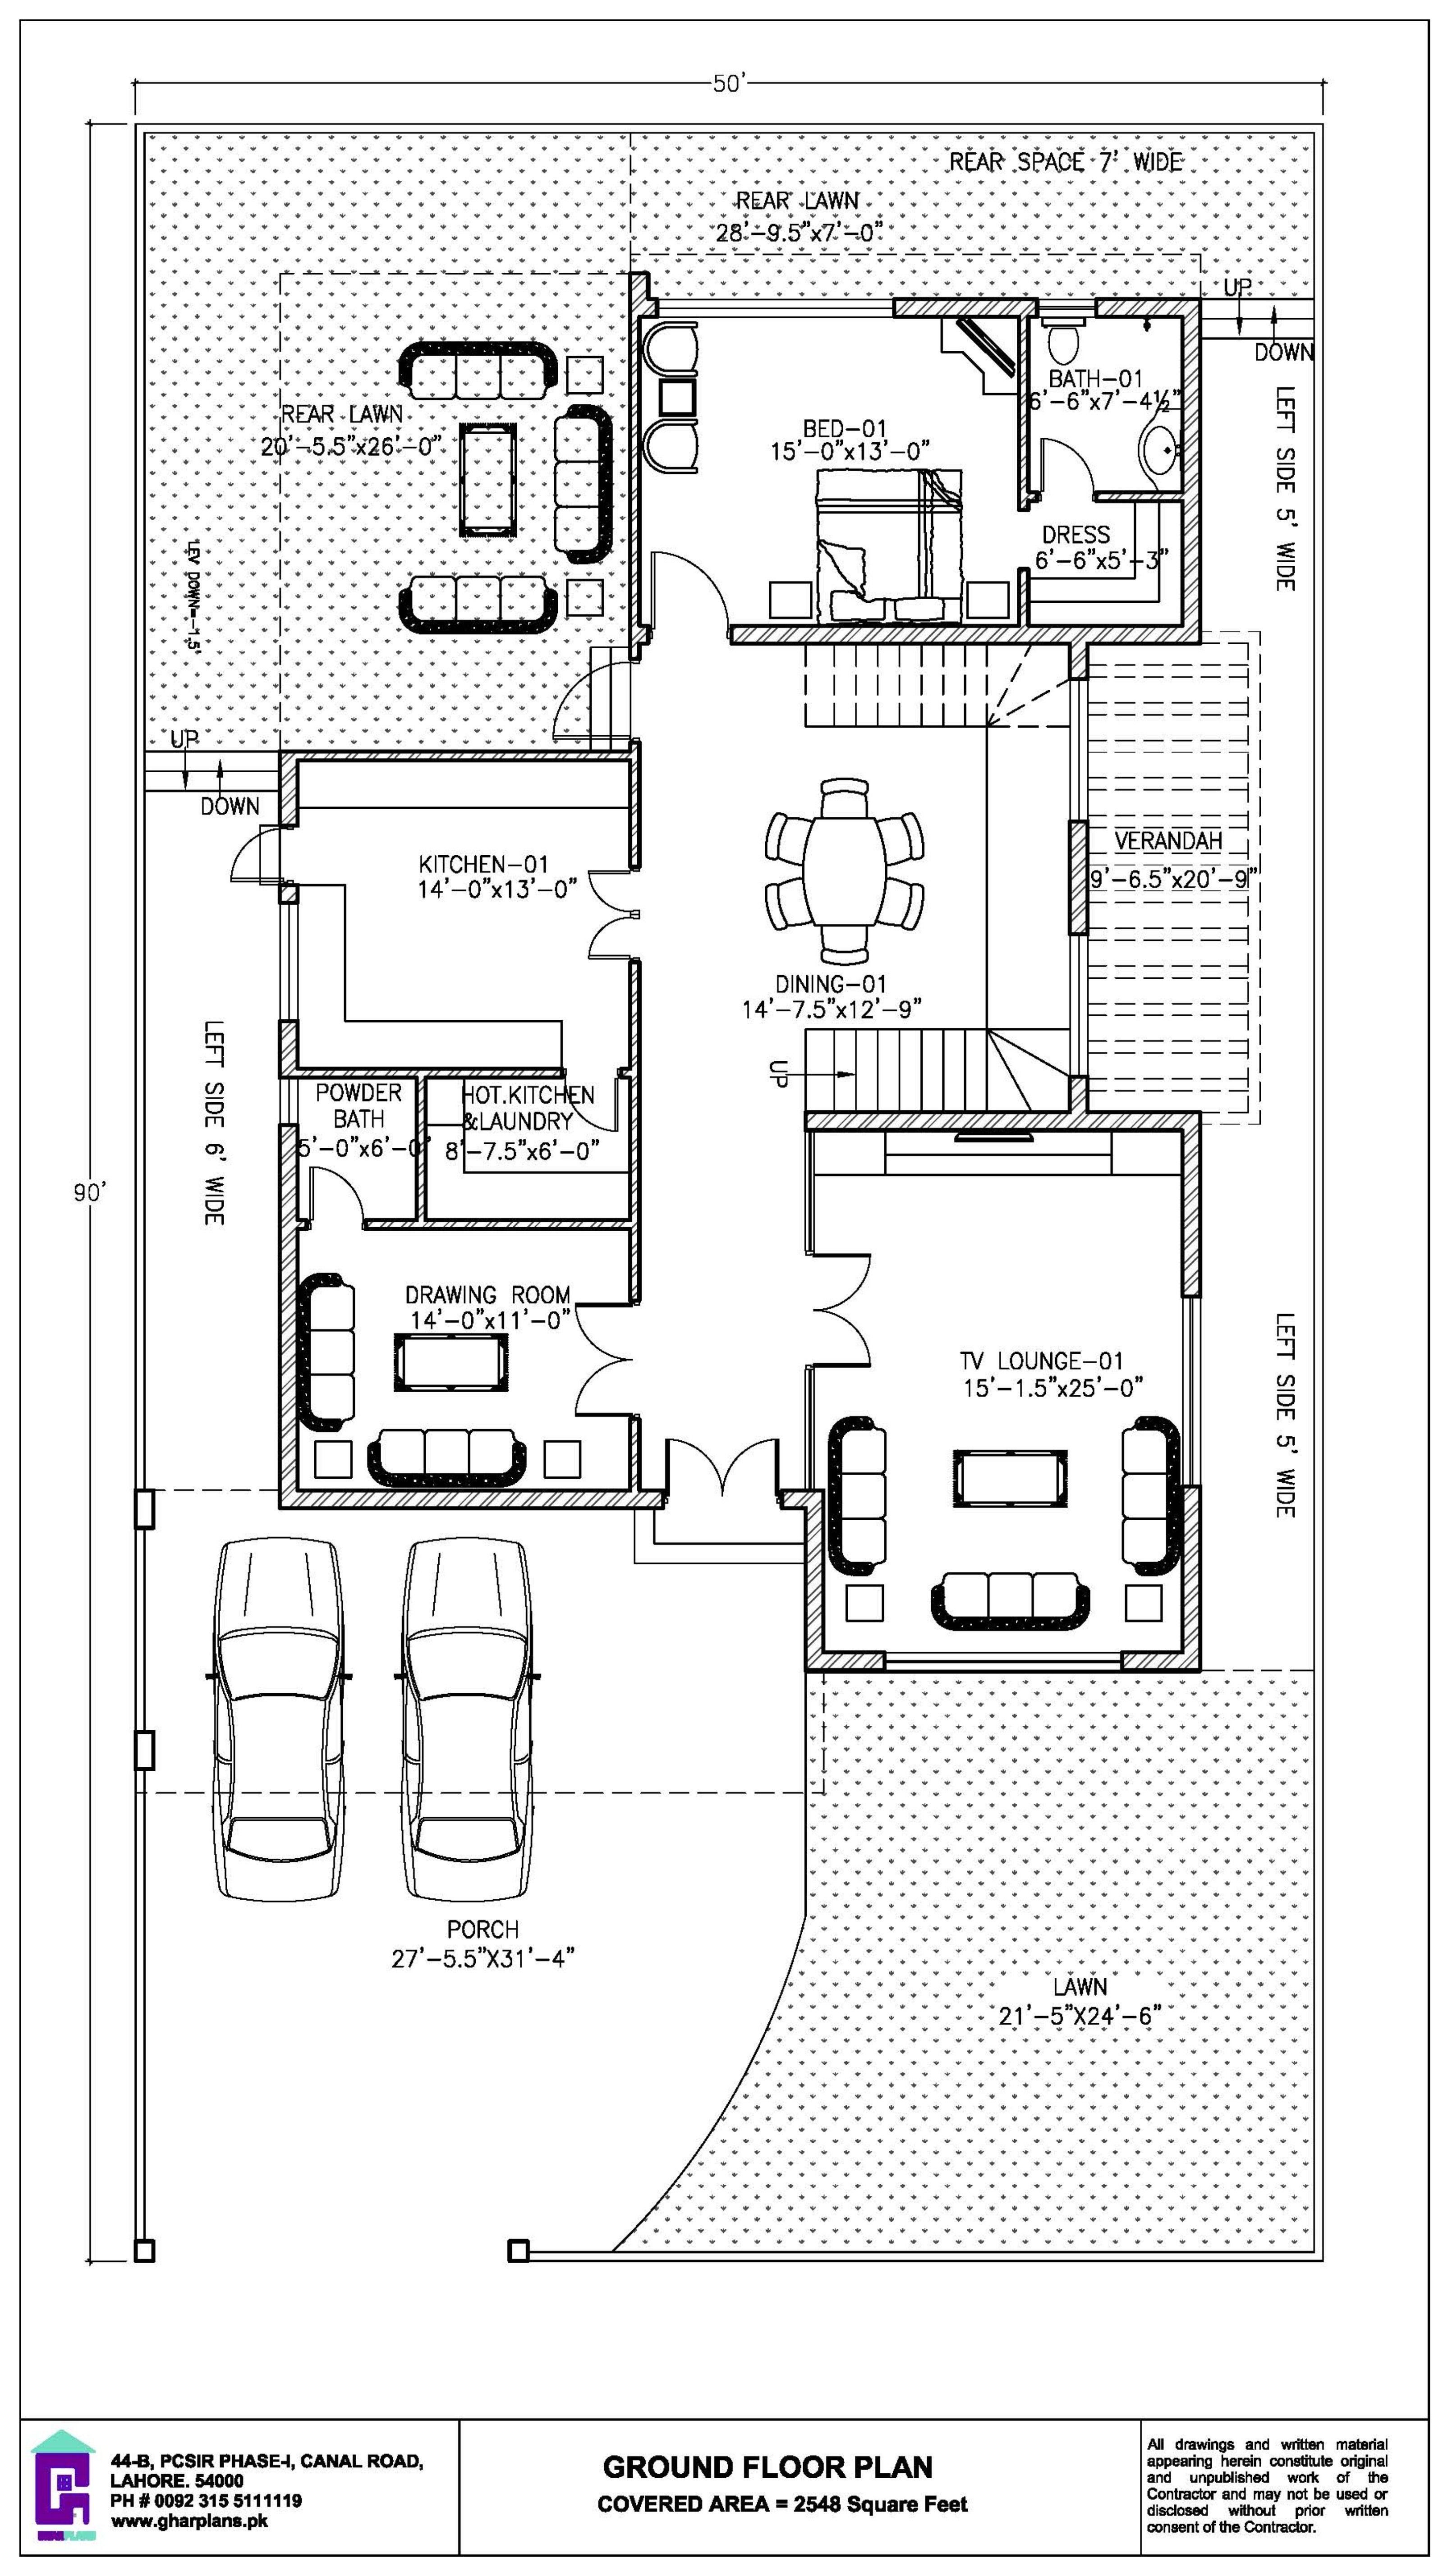 4 Bedroom One Kanal House Ground Floor Plan Ground Floor Plan House Plans Mansion Home Map Design